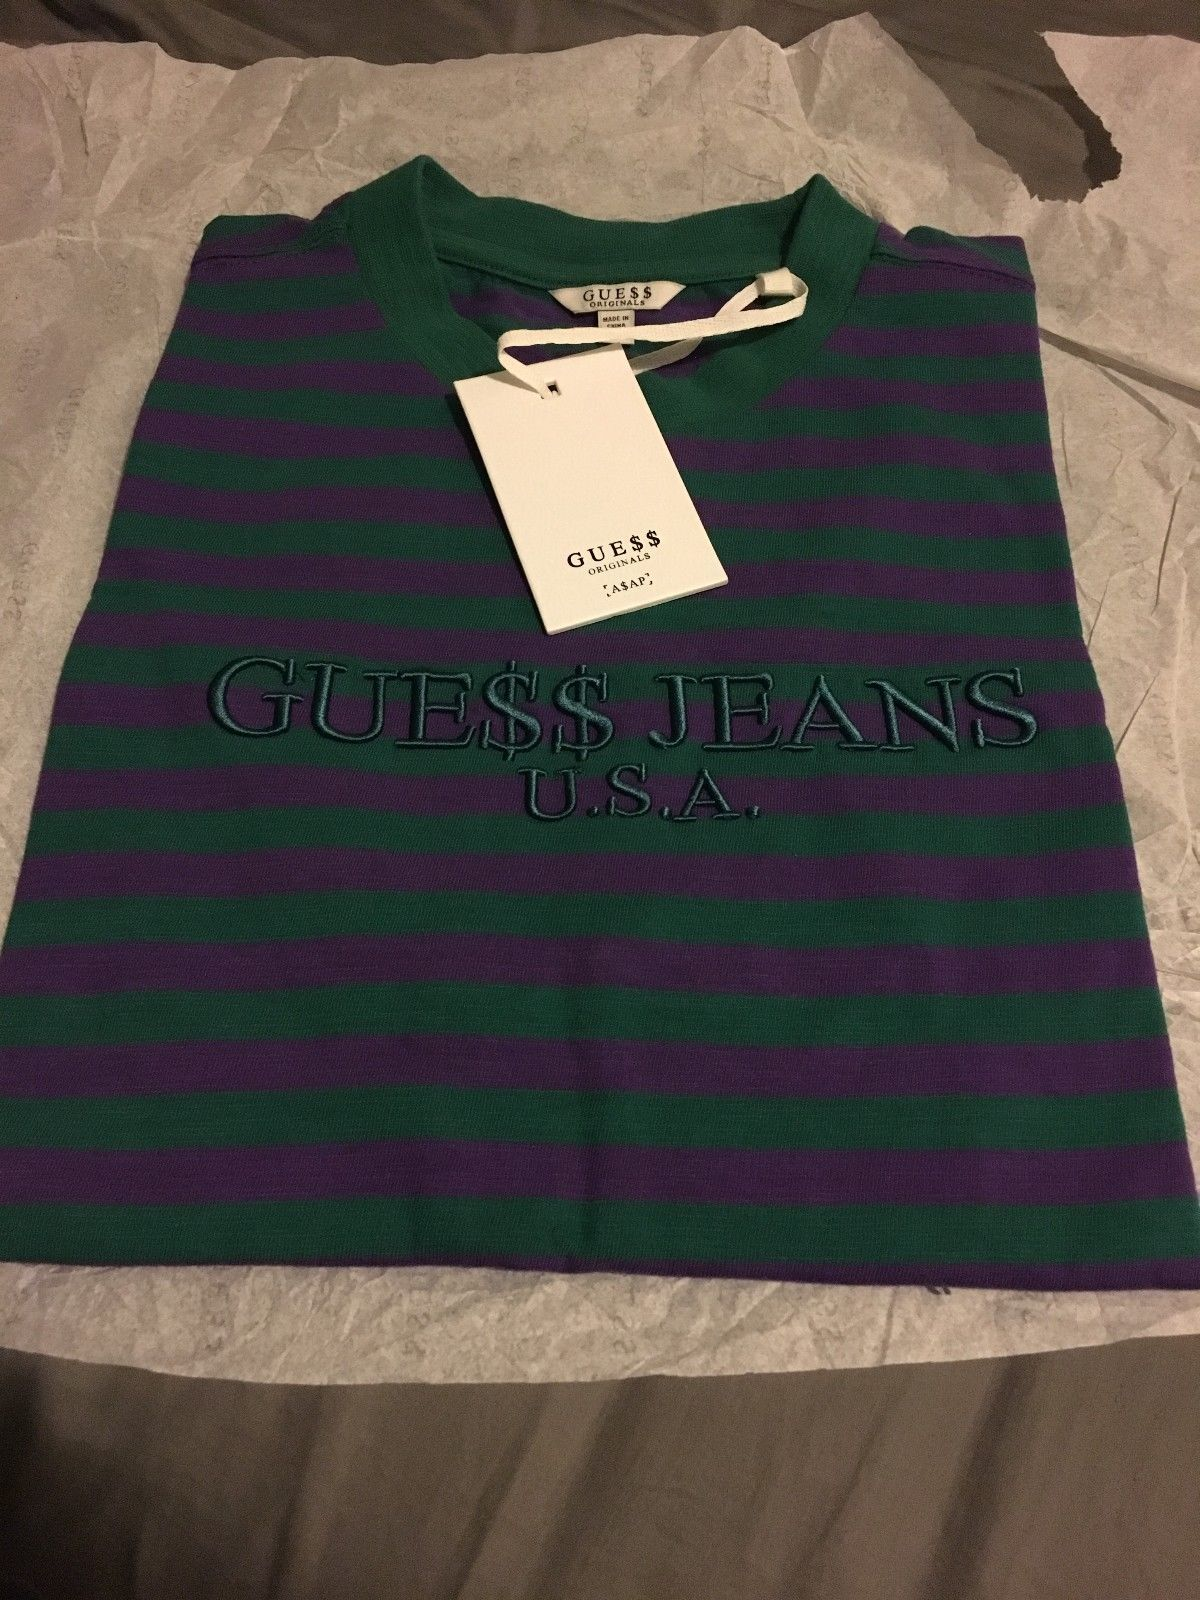 a34bcf62495b Guess x Asap Rocky Striped Shirt Green Purple Medium GUE$$ Jeans USA #rare